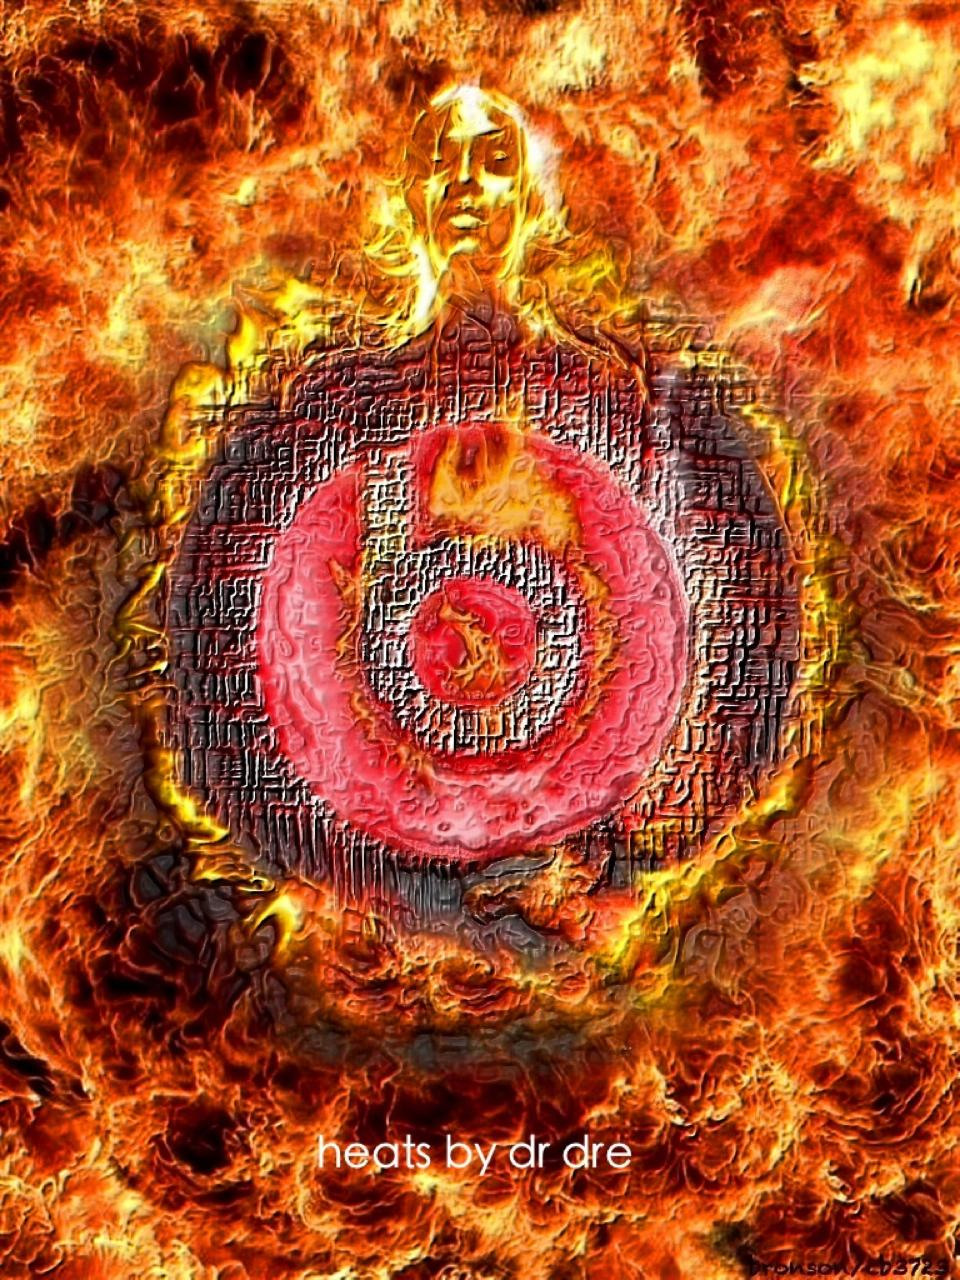 heats by dre - photo manipulation pop art